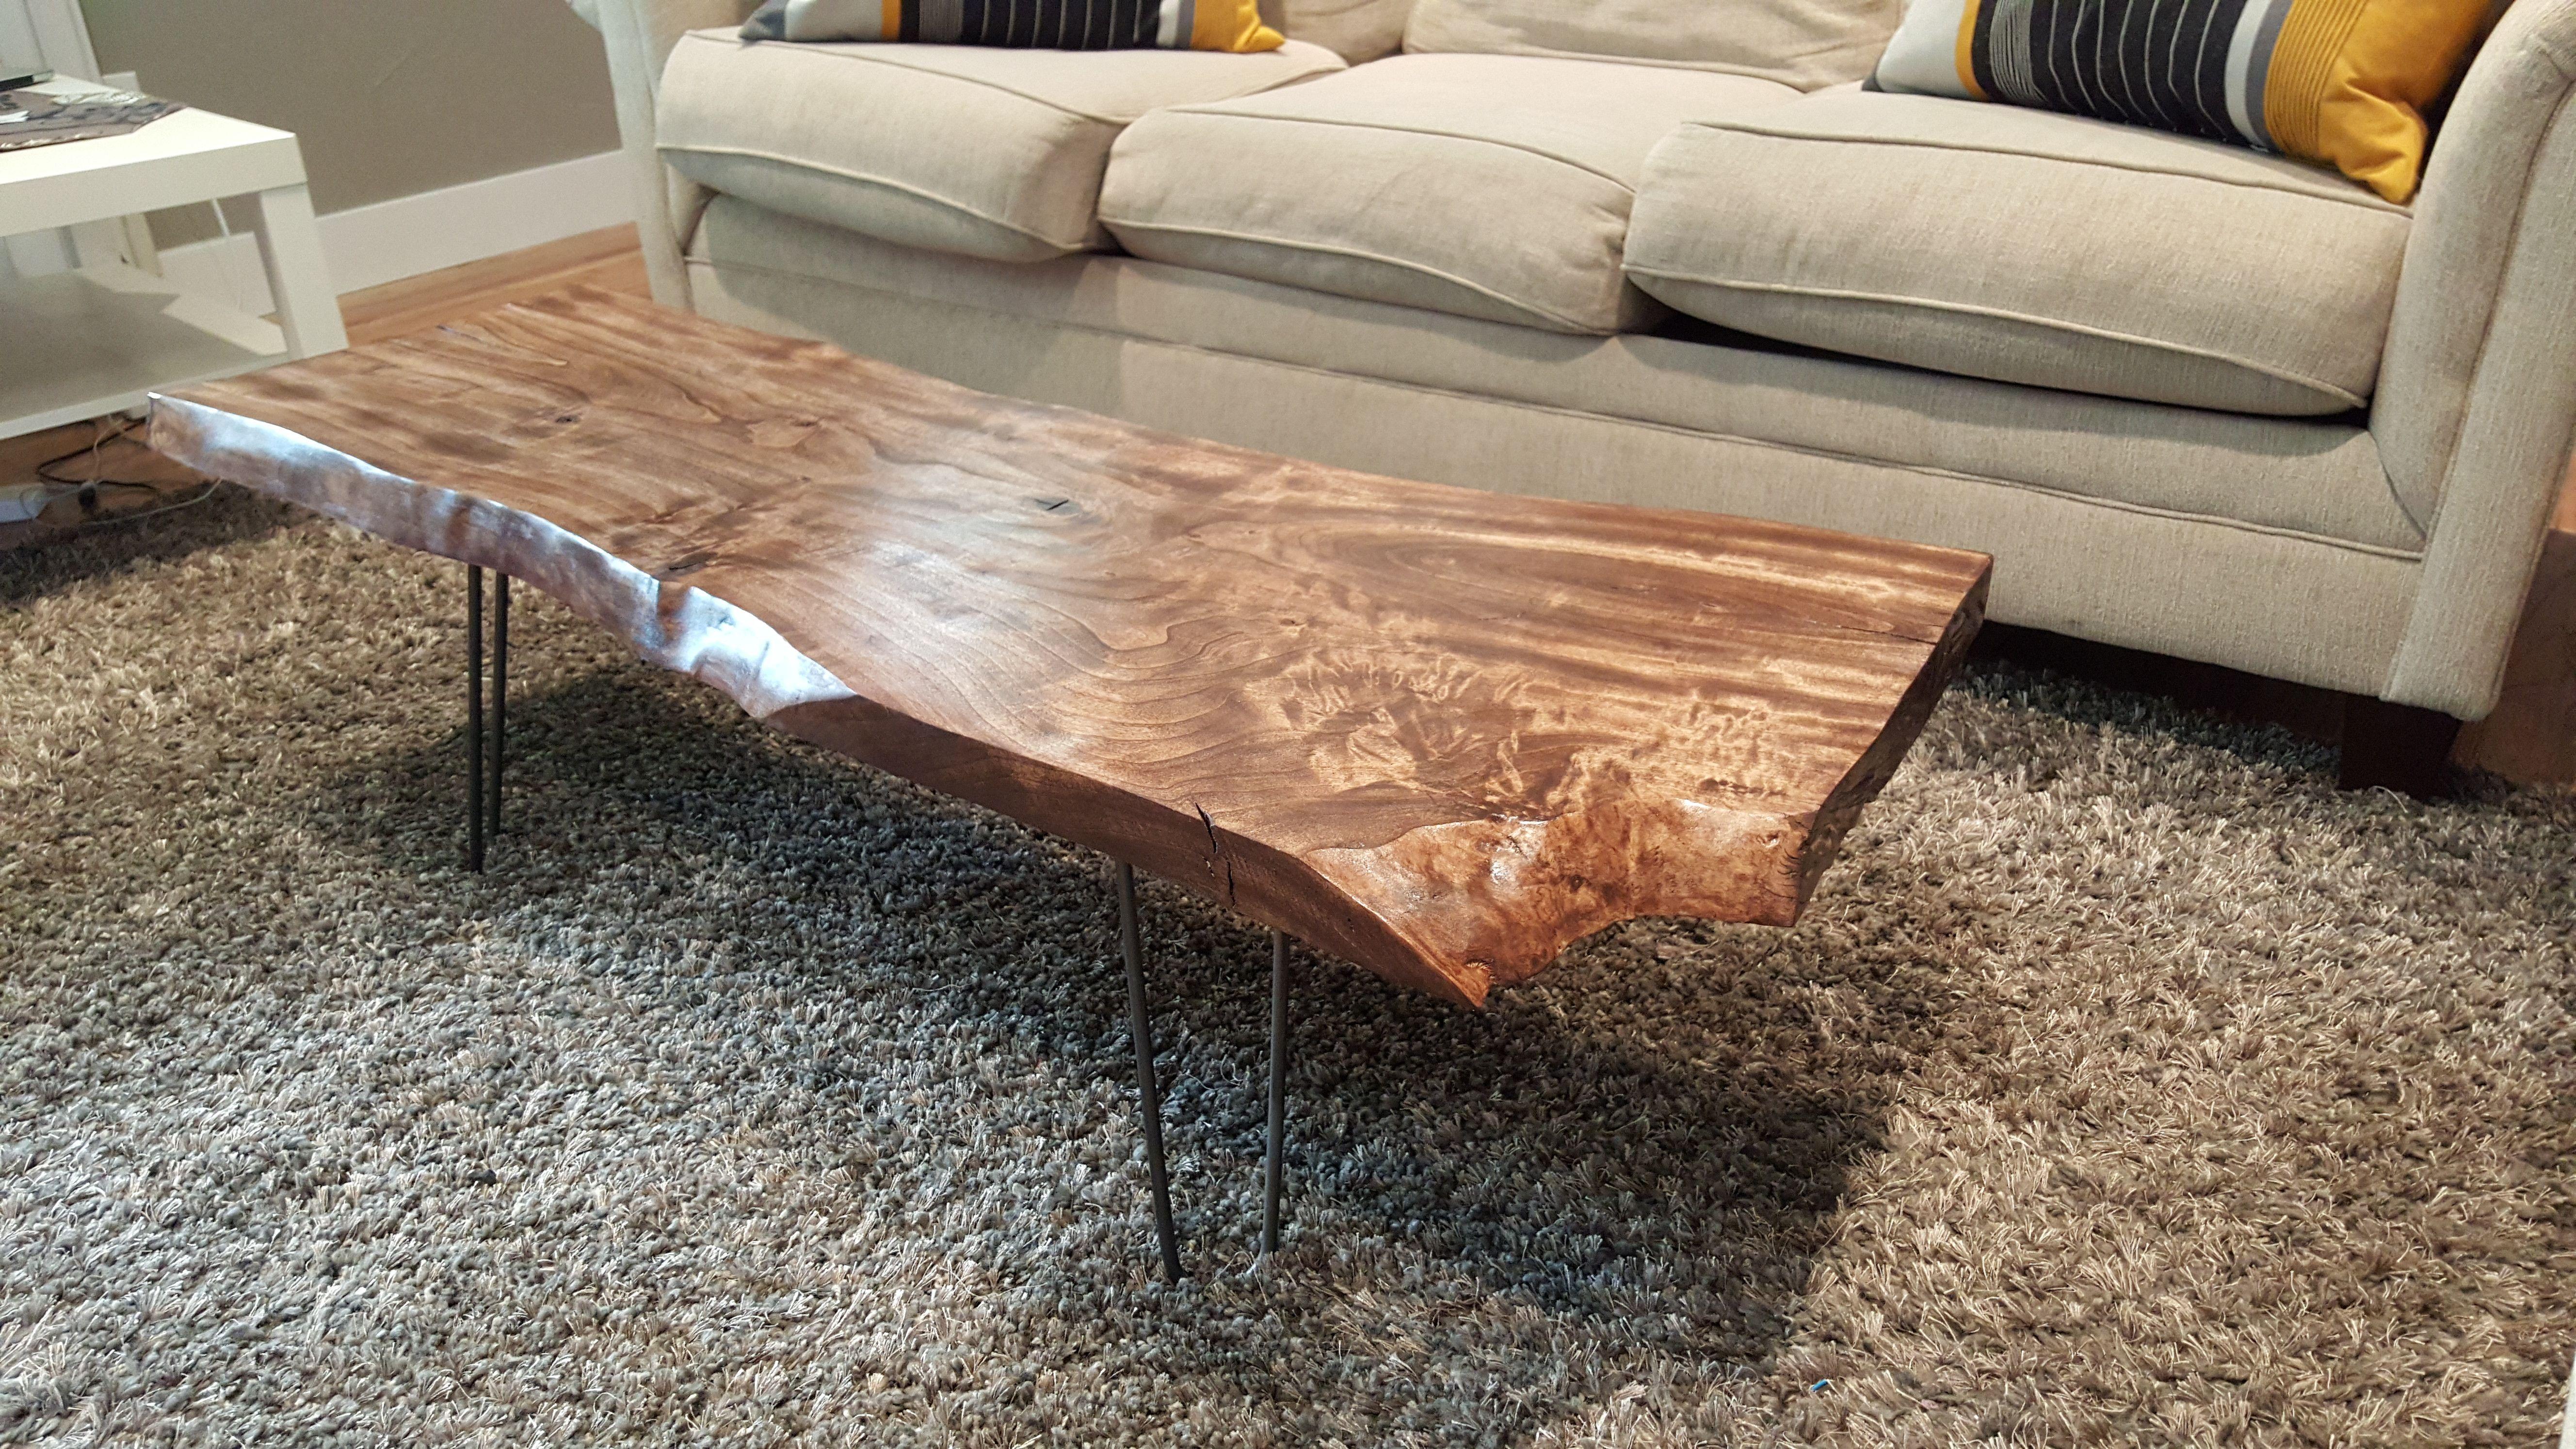 Diy Live Edge Wood Coffee Table Raw Wood Coffee Table Coffee Table Wood Wood Coffee Table Diy